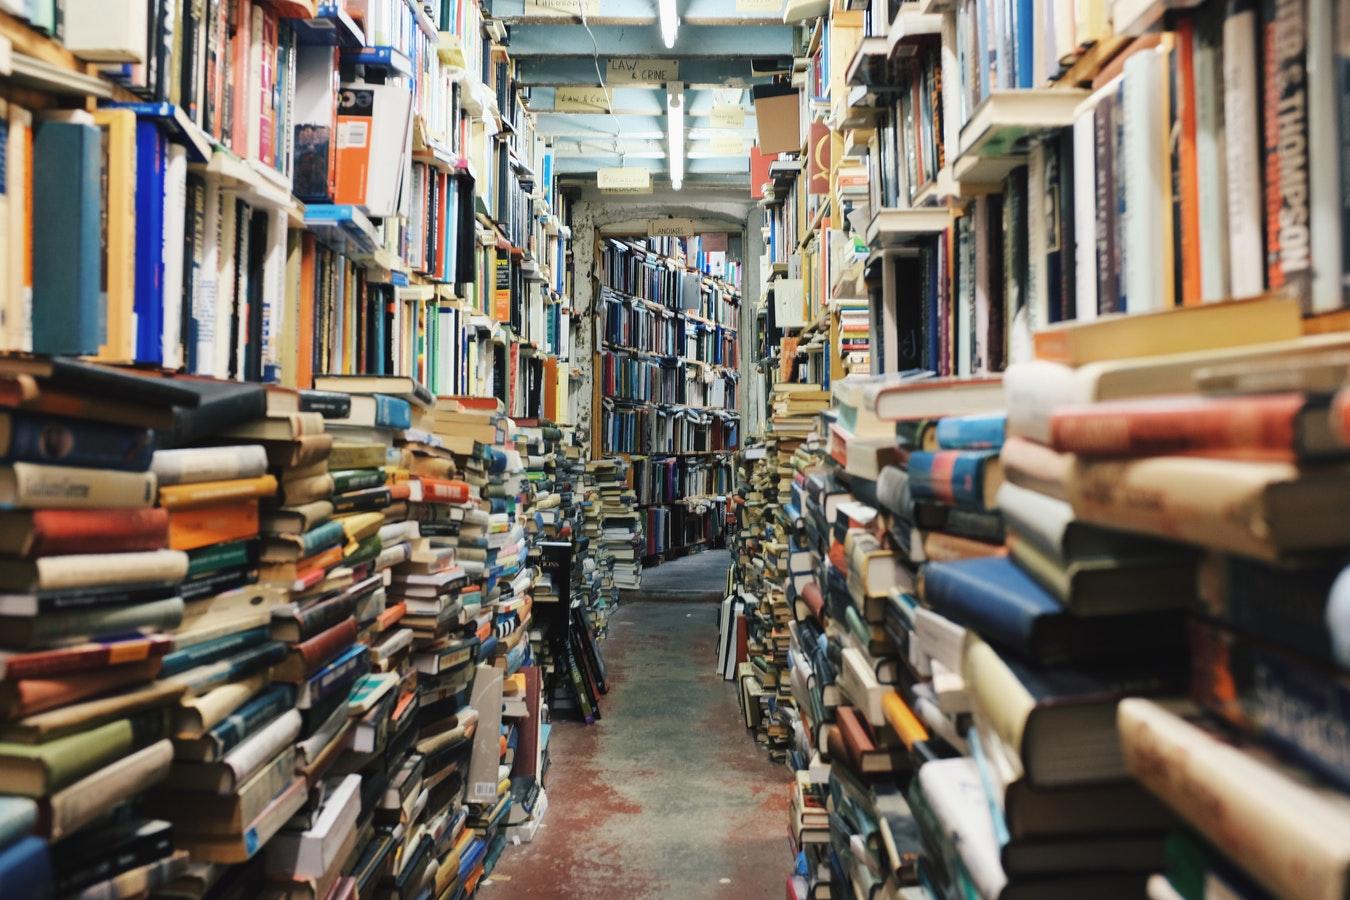 Thousand of Books